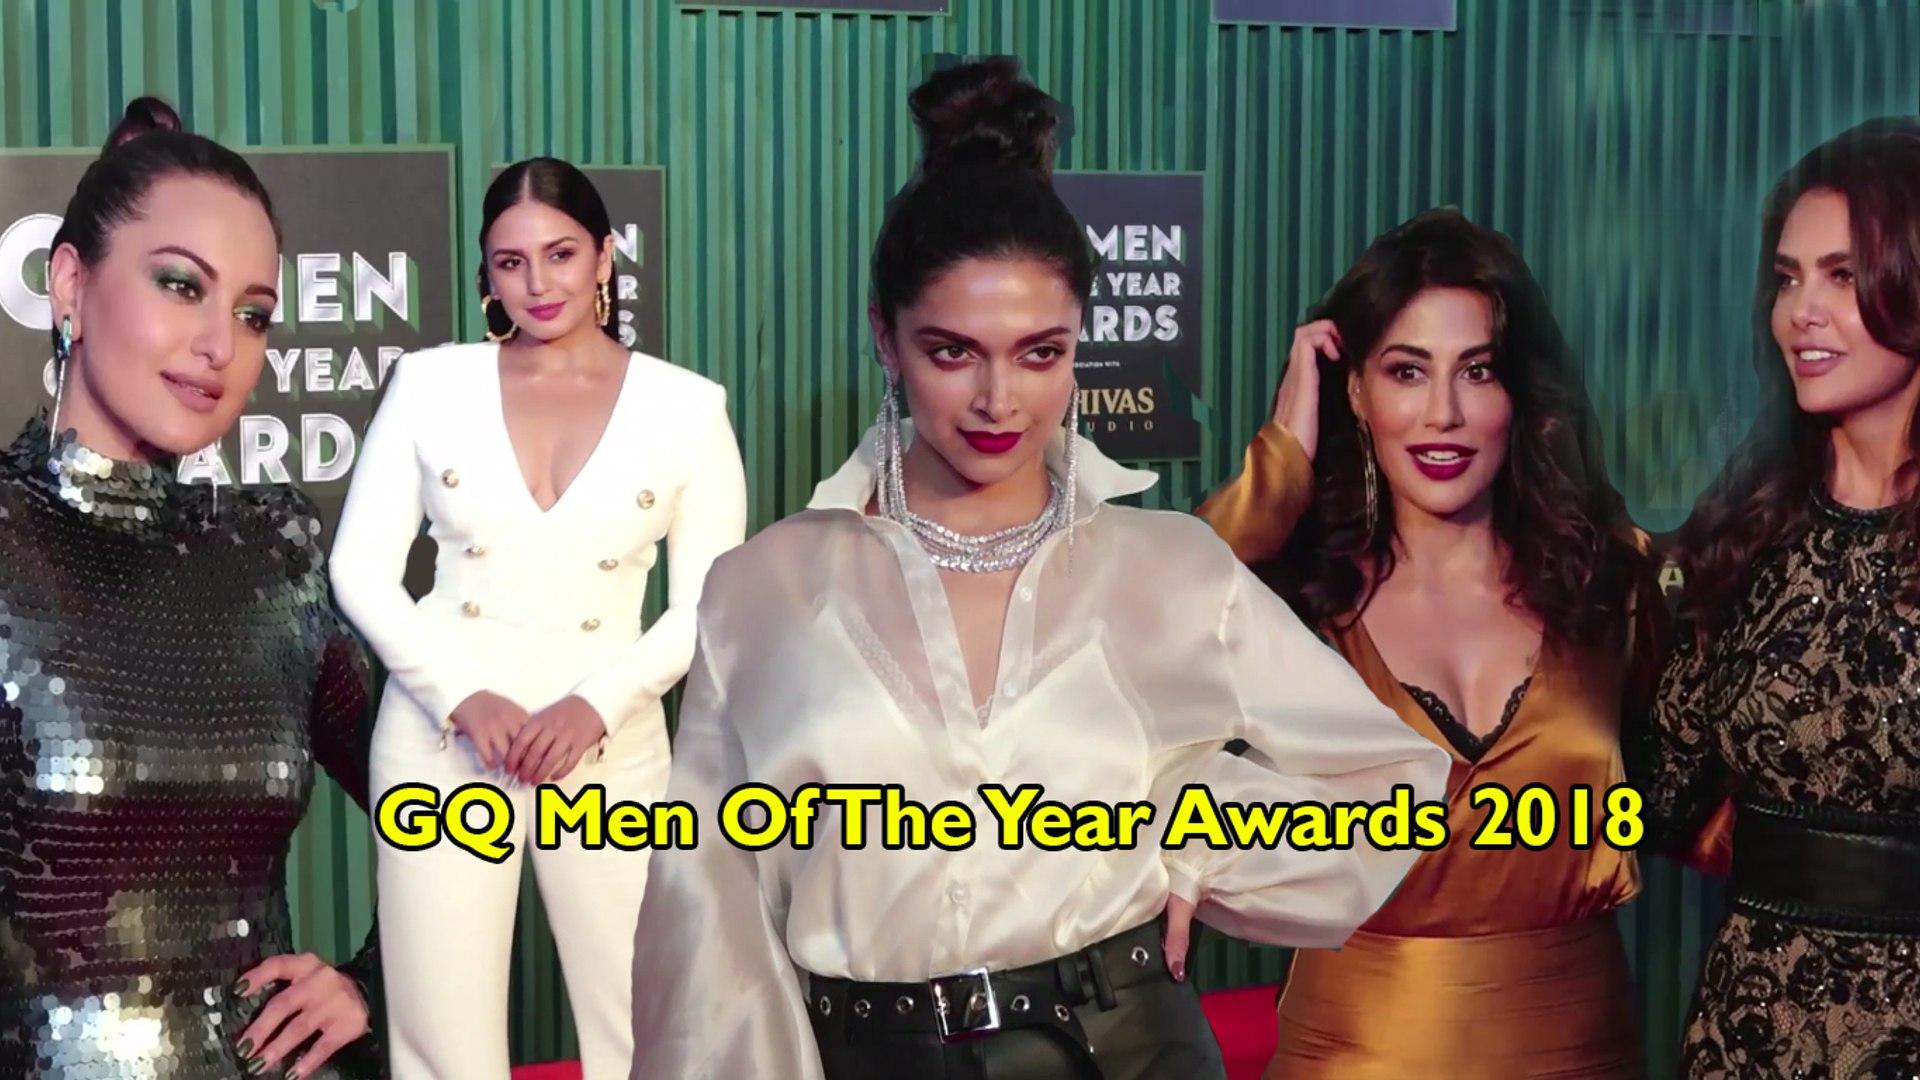 GQ Men Of The Year Awards 2018 | Deepika, Saif, Tiger Shroff, Sonakshi, Karan & More | FULL EVEN